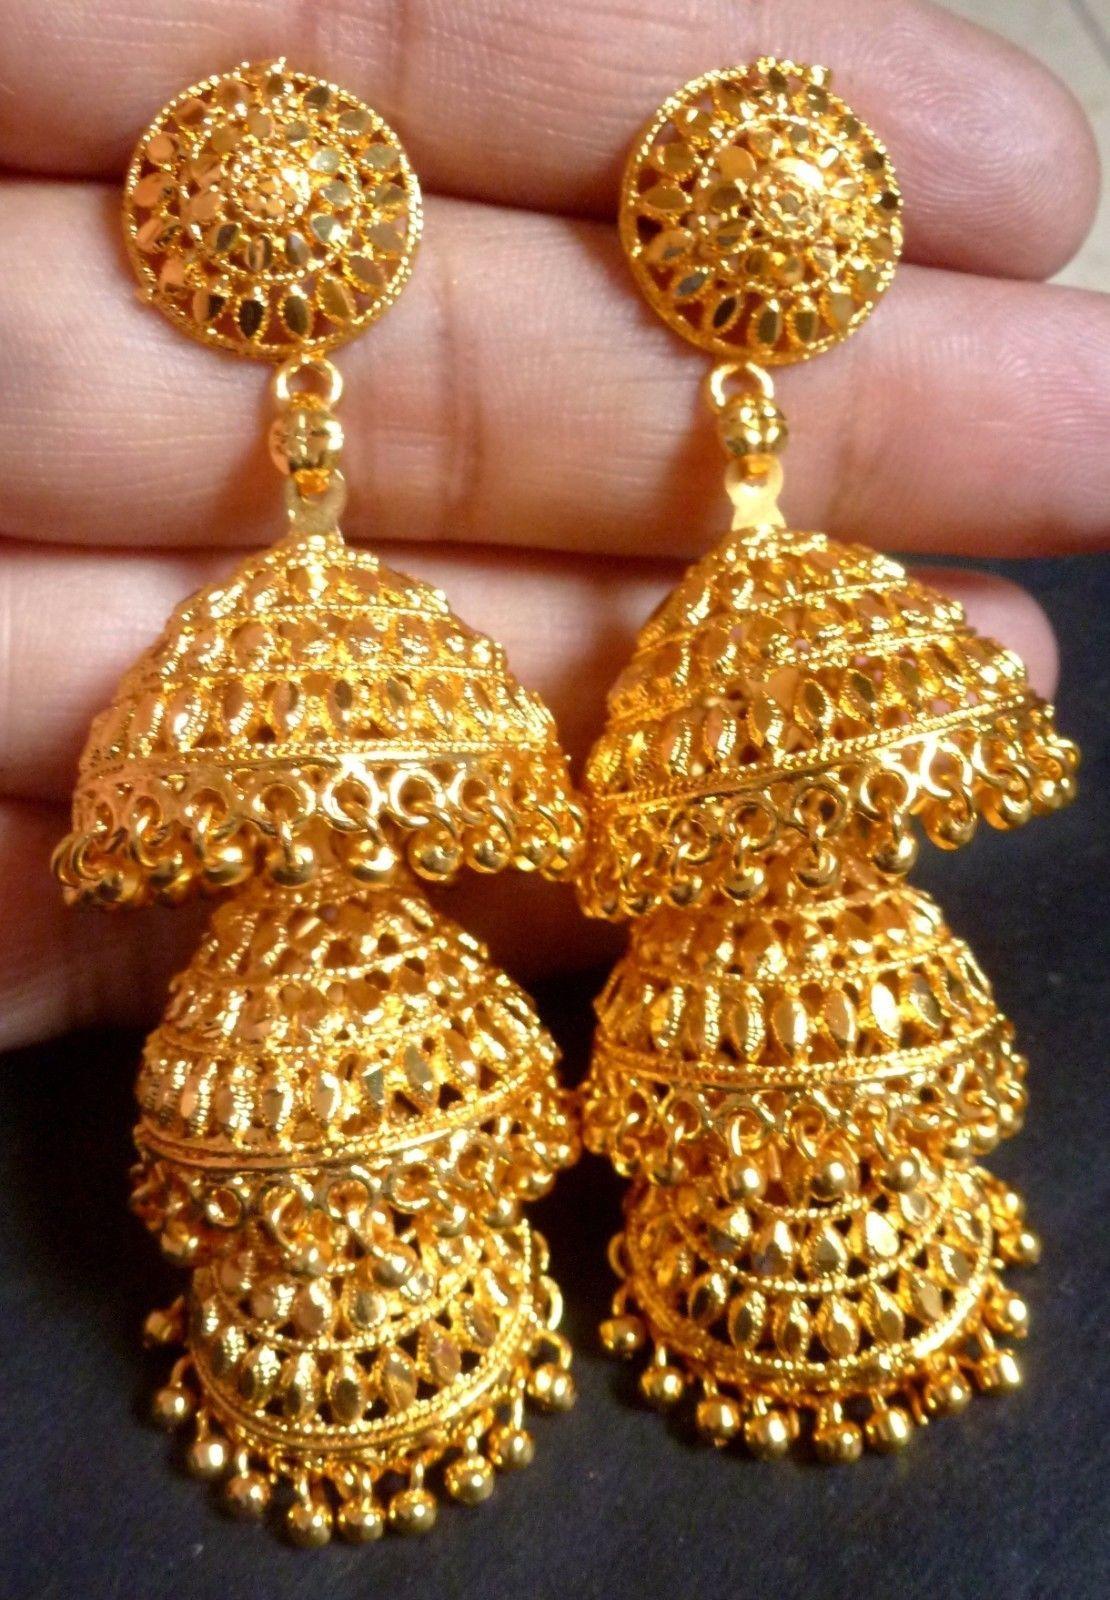 196c18acb $11.04 - 22K Gold Plated 3 Steps Indian Wedding Jhumka 3'' Long Wedding  Earrings #ebay #Fashion